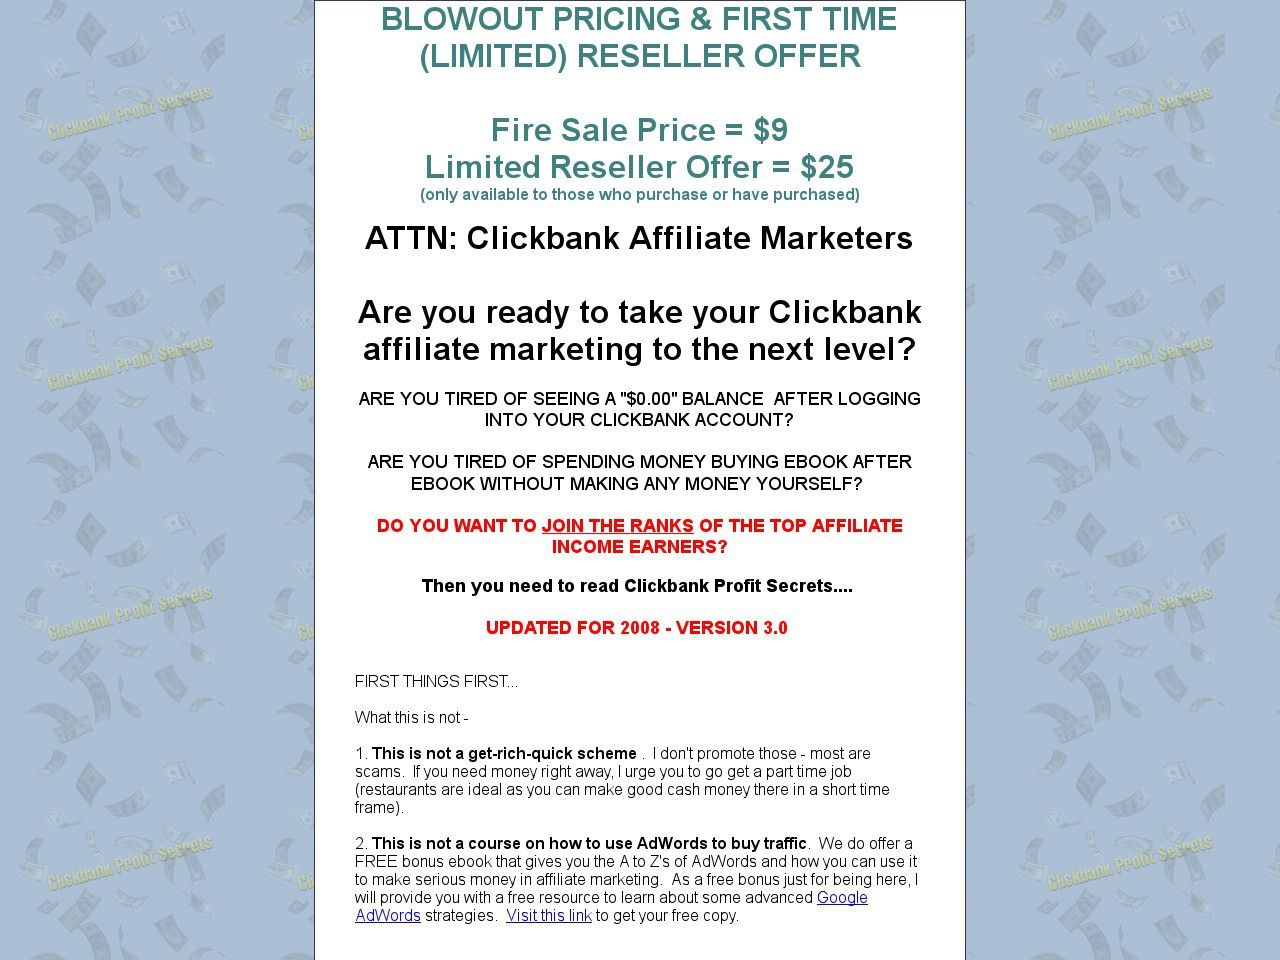 [Get] CB Profit Secrets - http://www.vnulab.be/lab-review/cb-profit-secrets ,http://s.wordpress.com/mshots/v1/http%3A%2F%2Fforexrbot.webteam.hop.clickbank.net